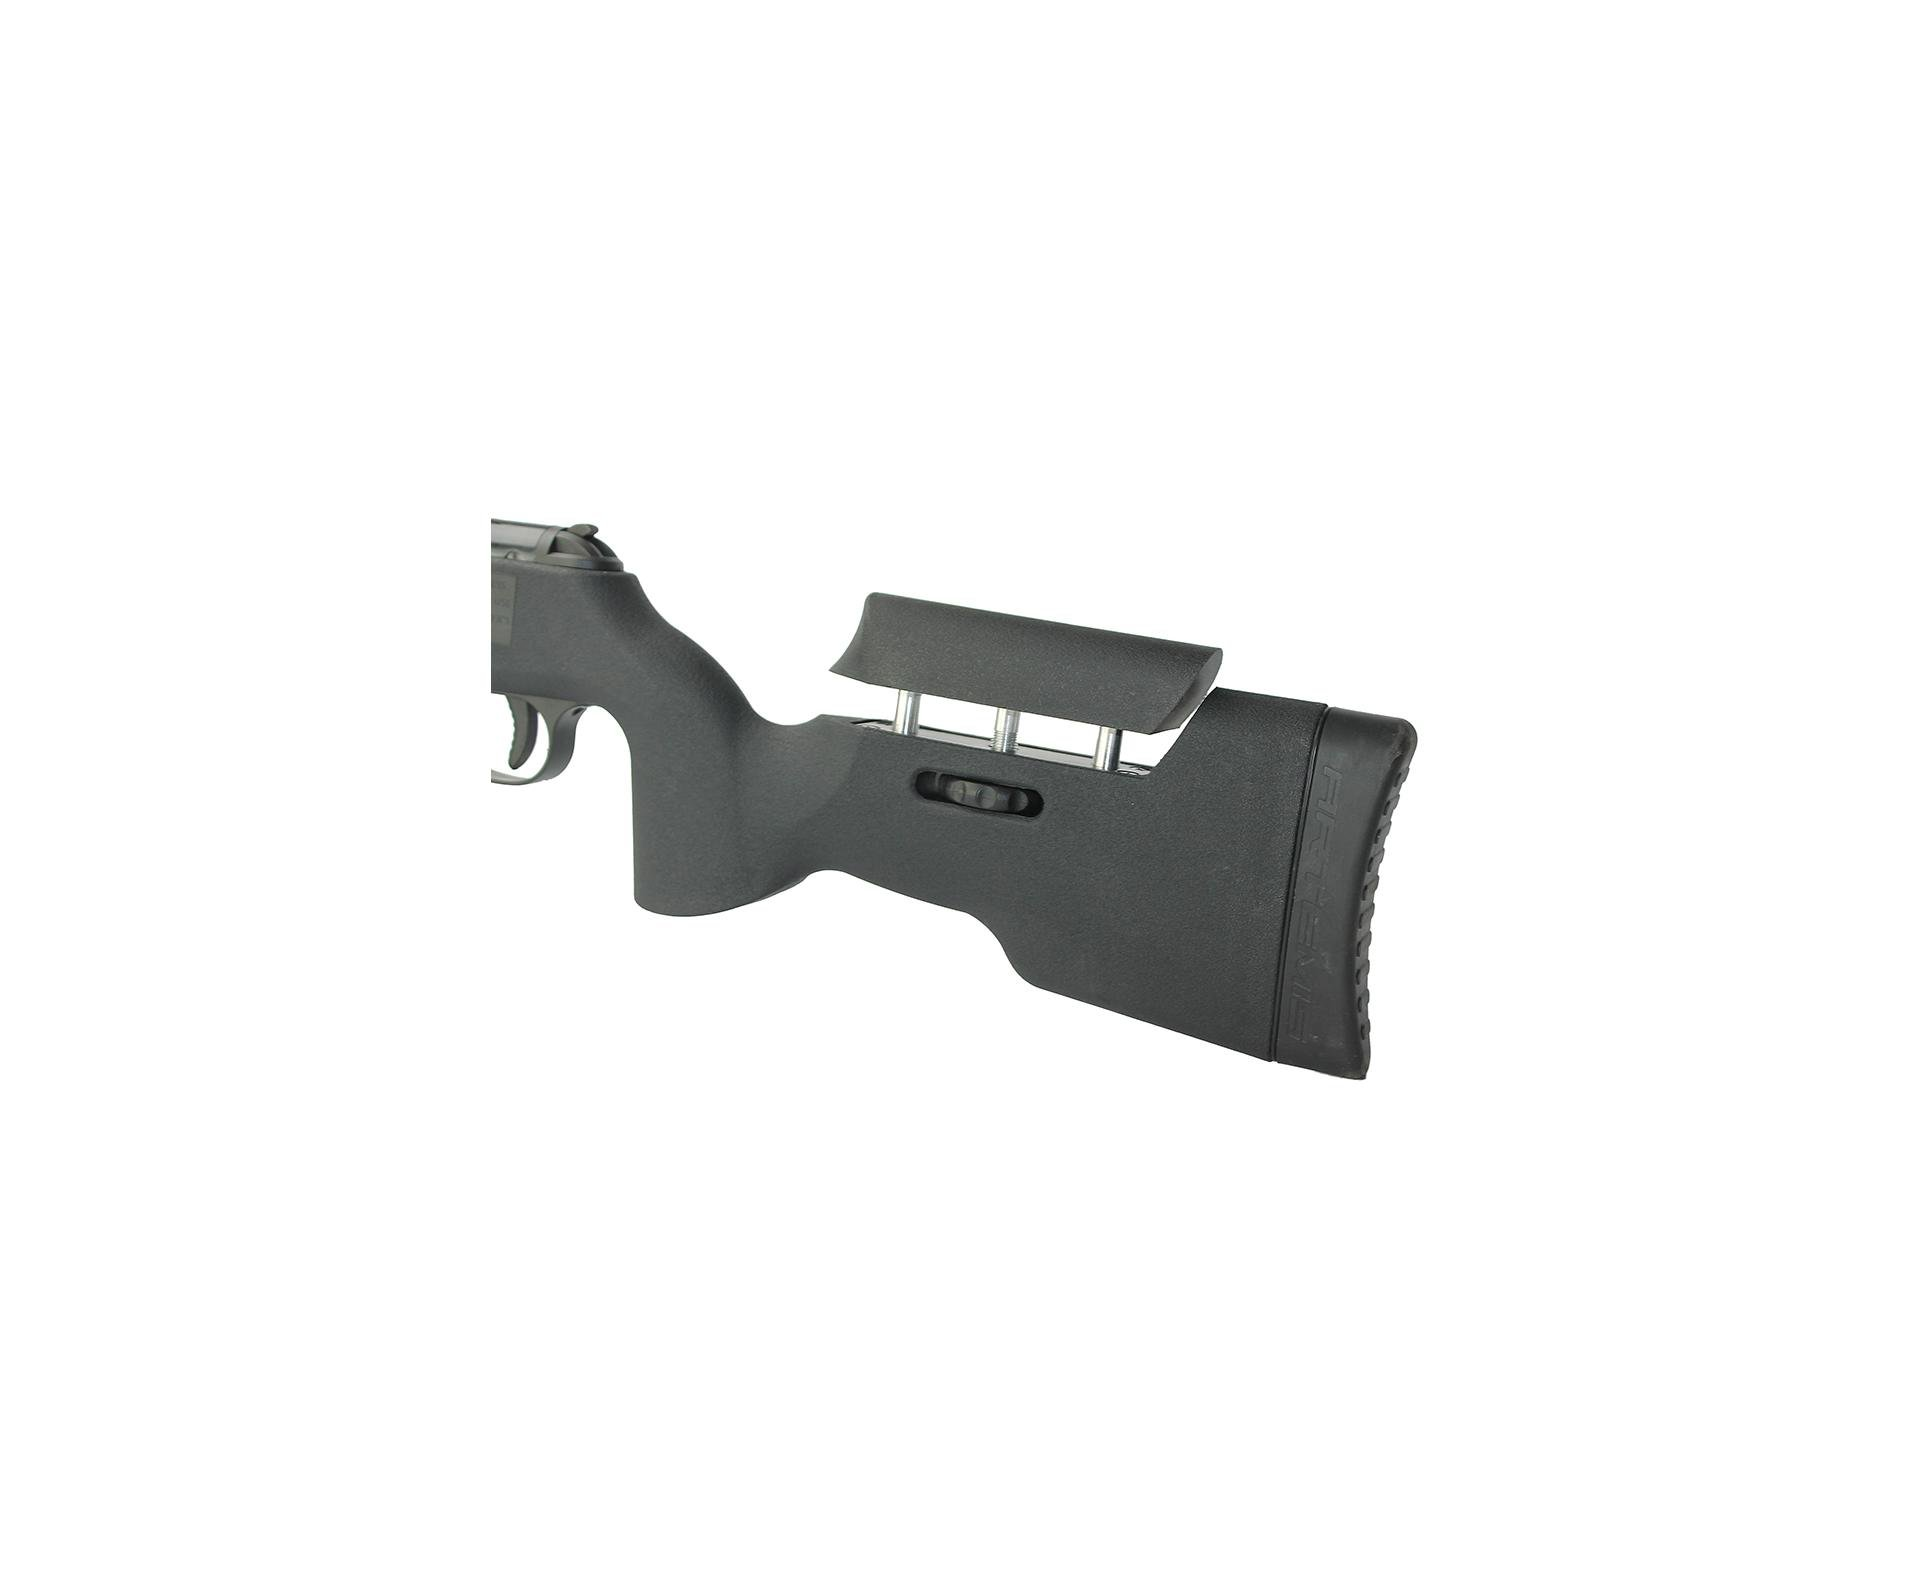 Carabina De Pressão Artemis Gp 1250 Sniper Gas Ram 70kg Black 4.5mm